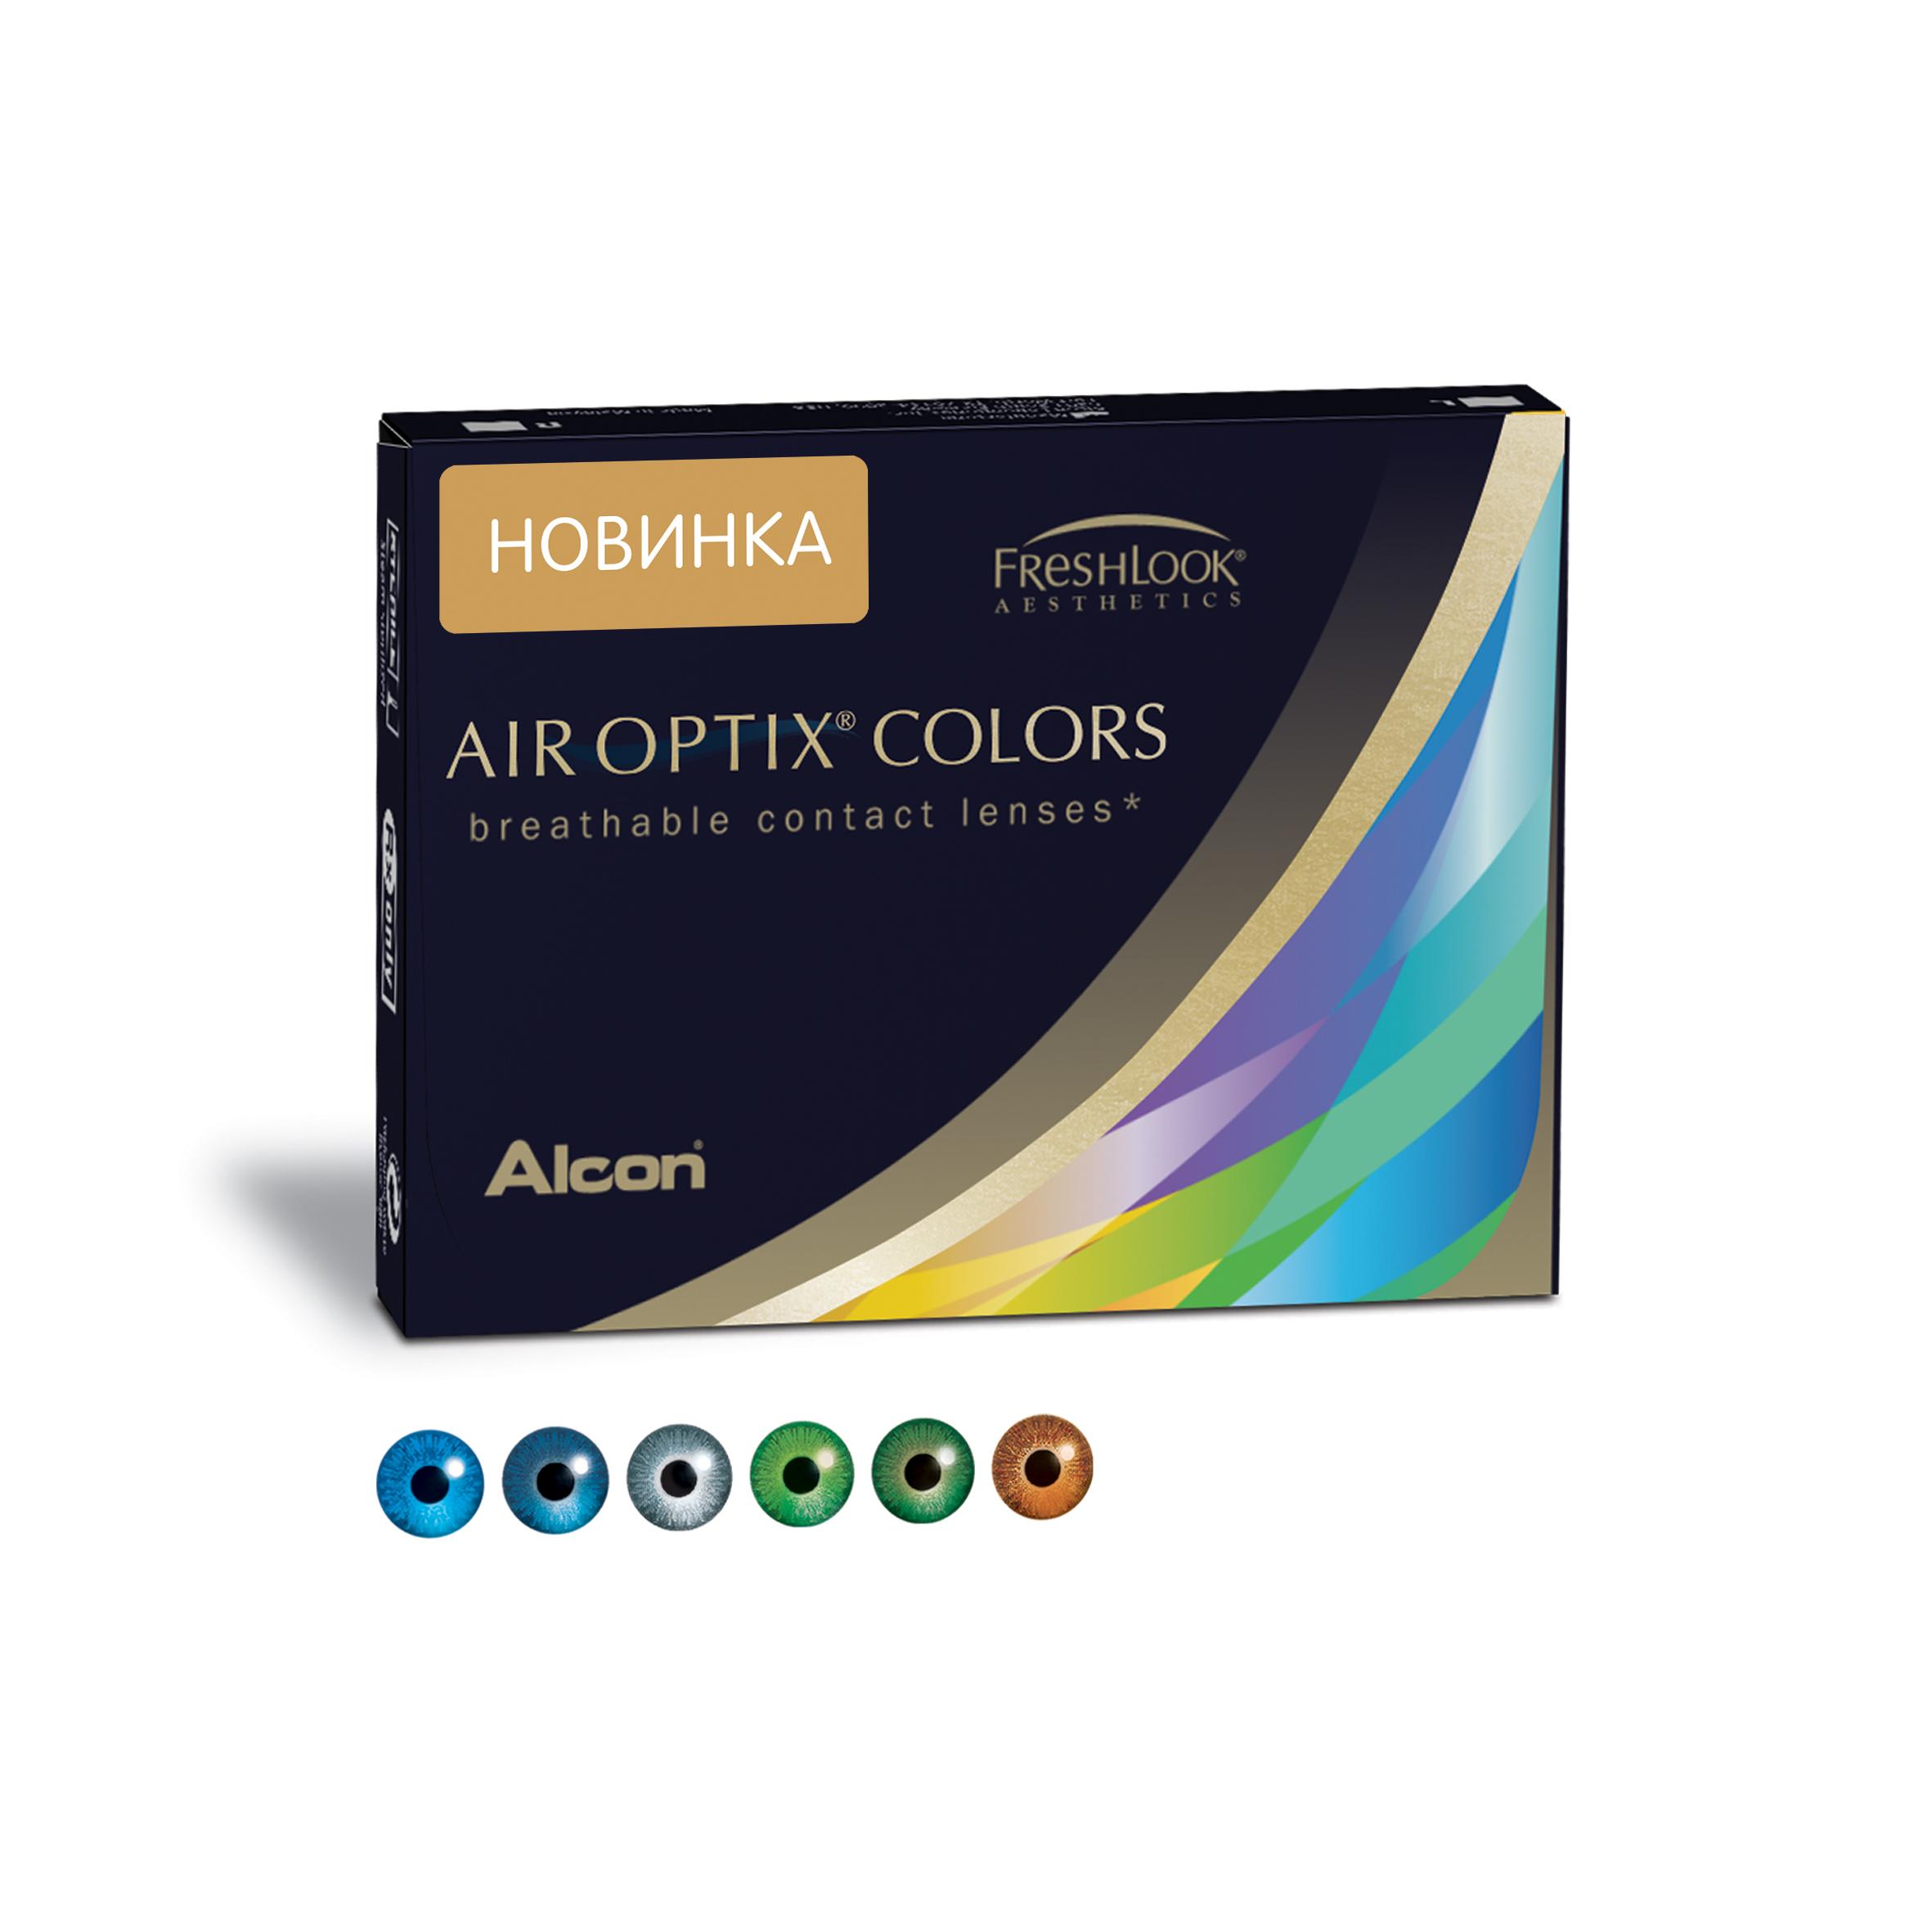 Аlcon контактные линзы Air Optix Colors 2 шт -4.50 Blue ( 31746247 )